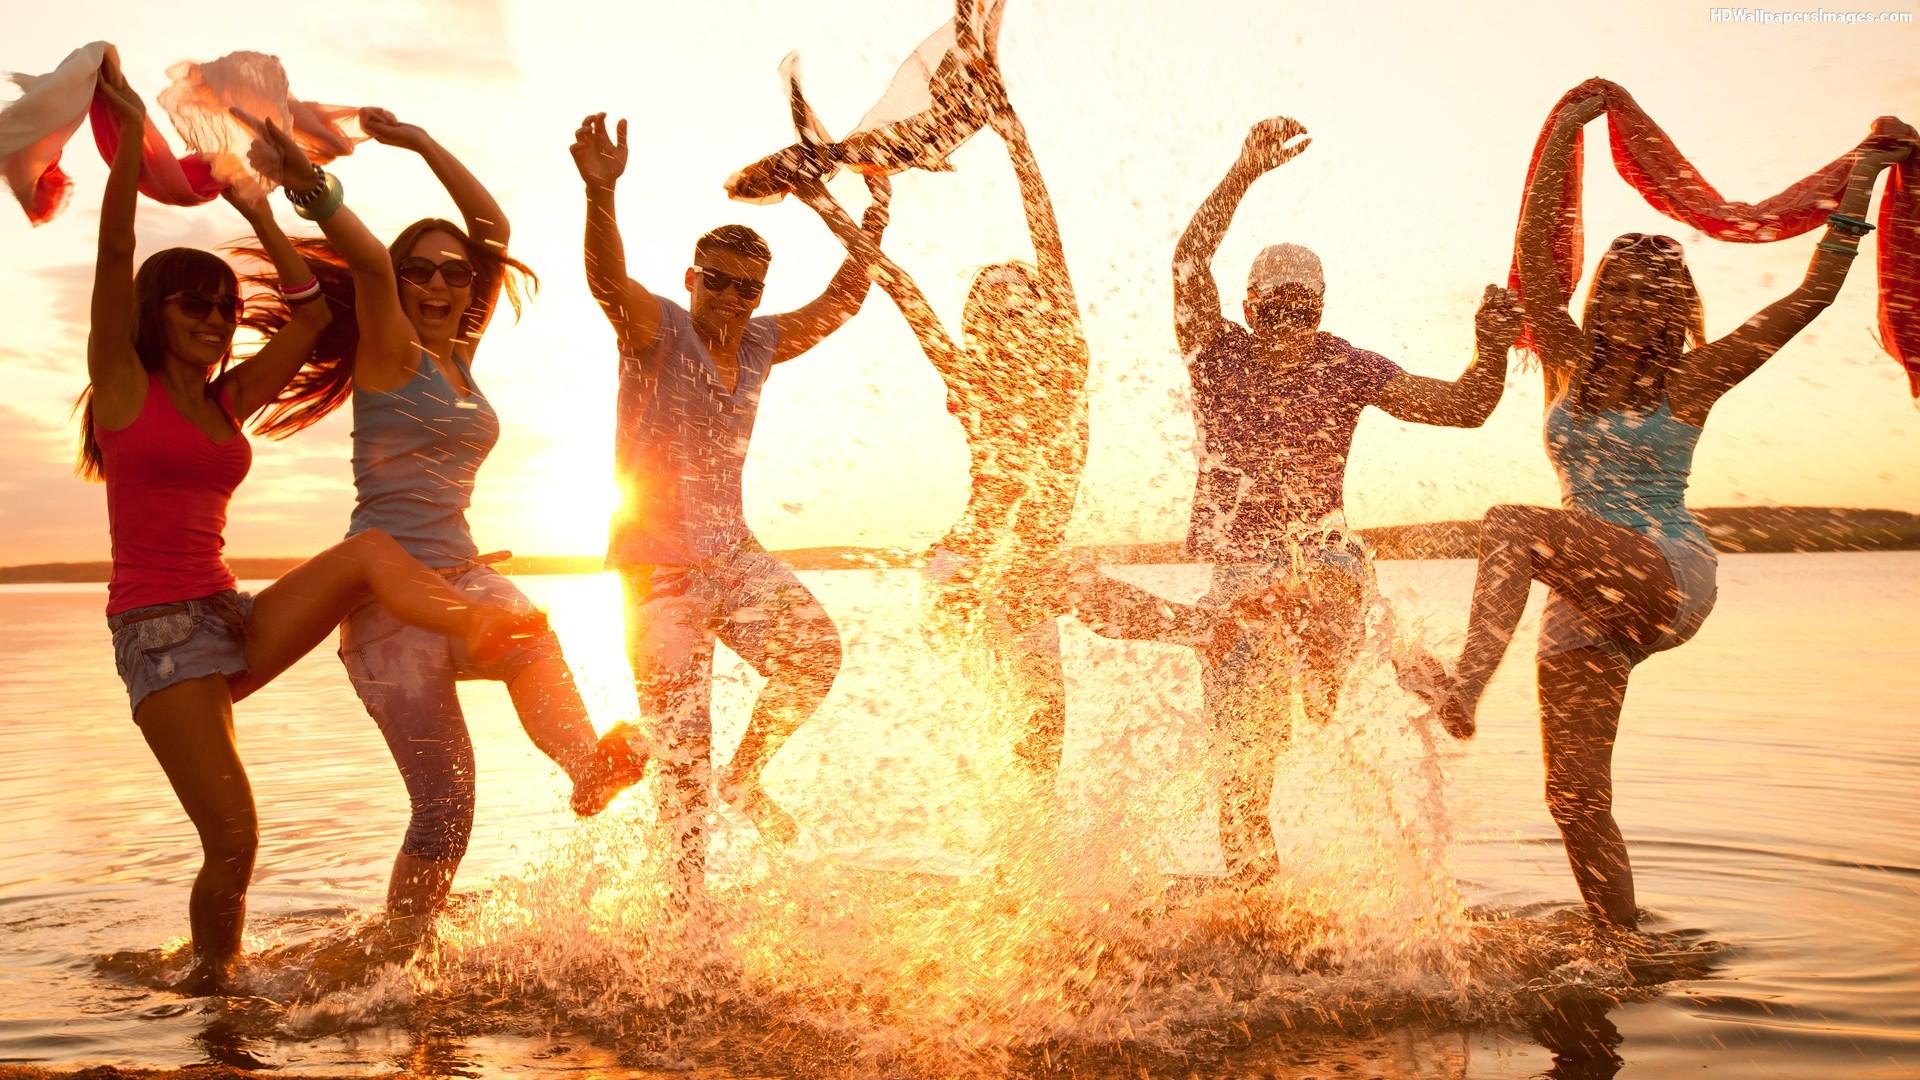 Friends Party Dance In Beach Images St Maarten Map